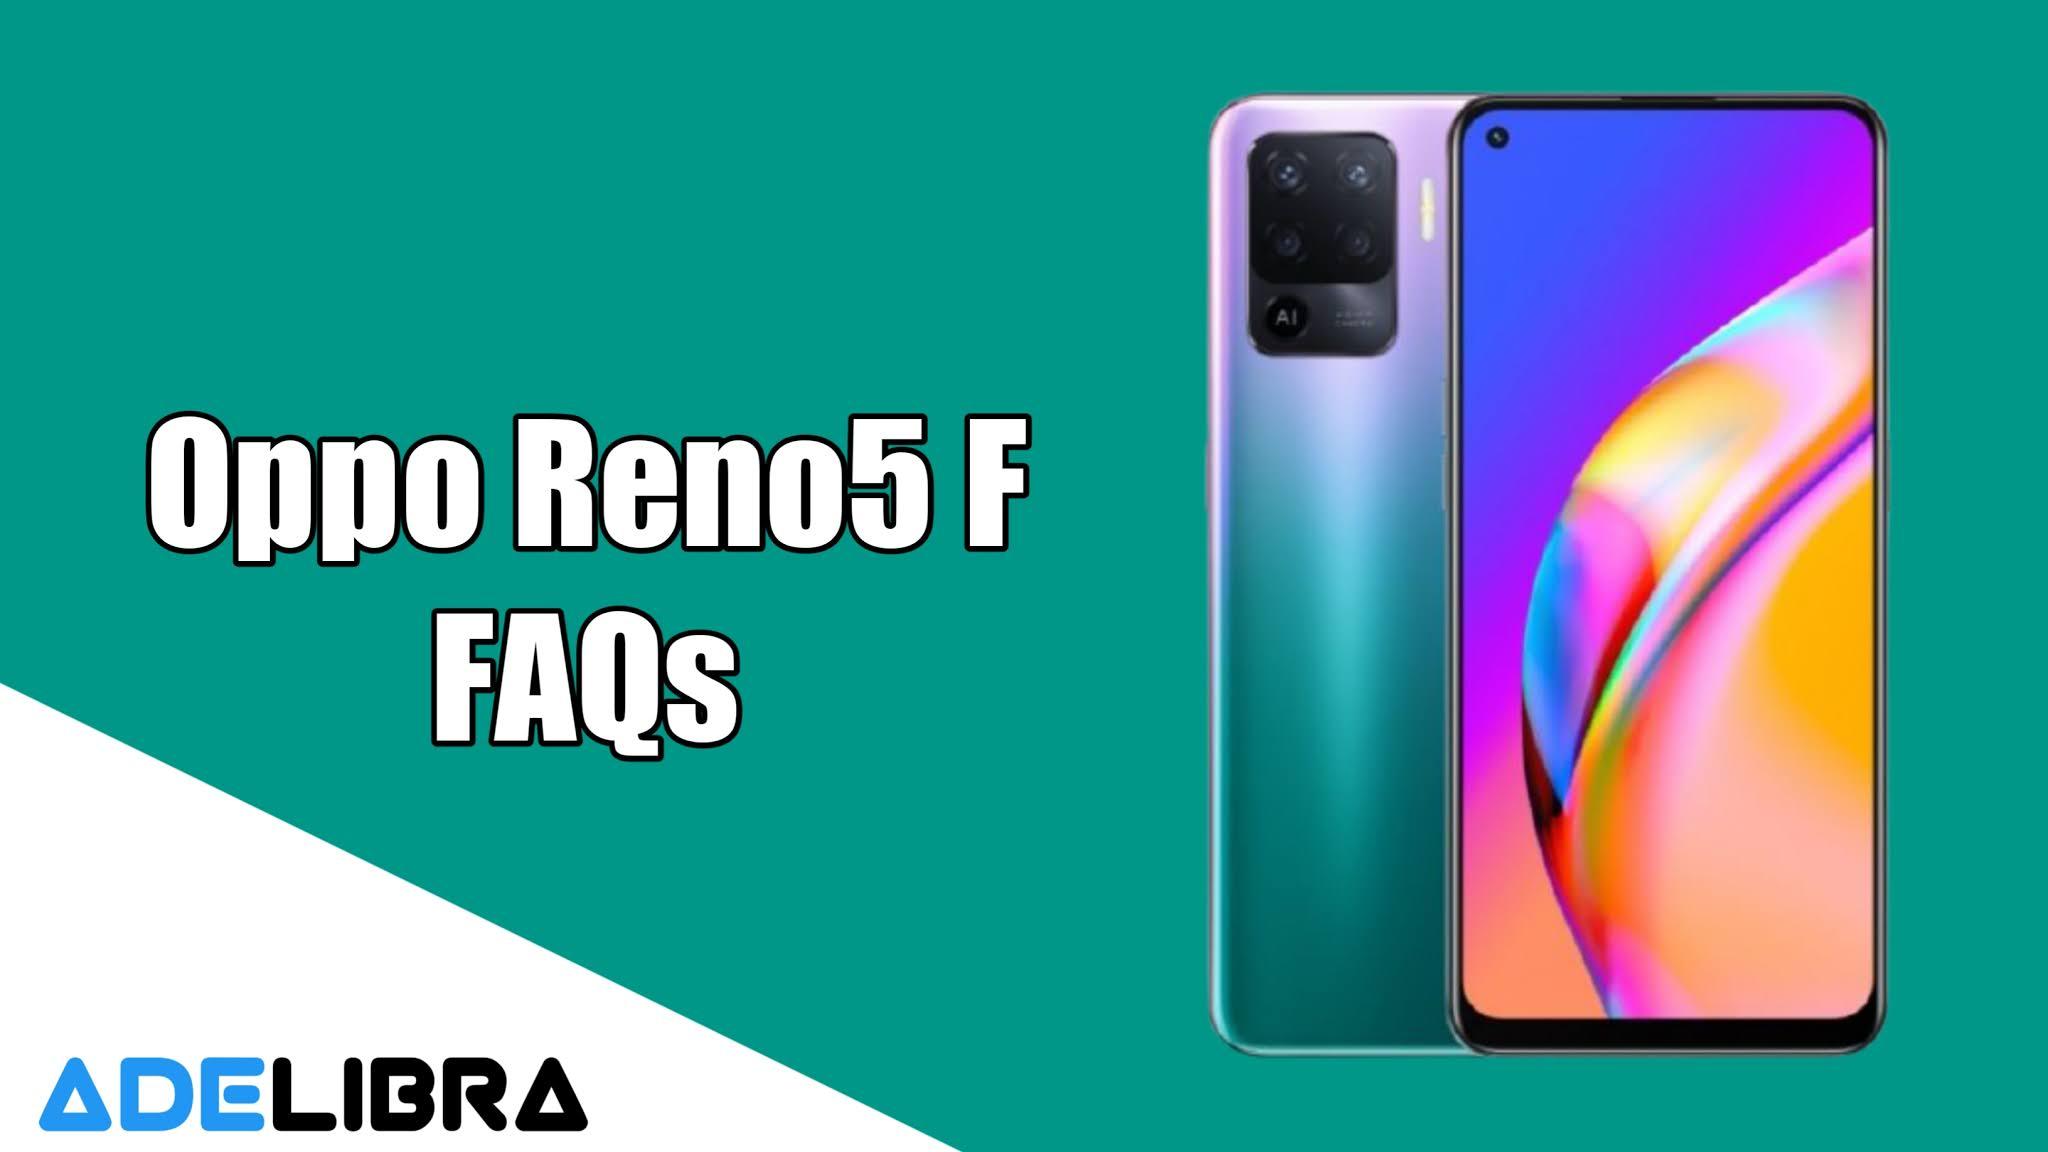 Oppo Reno5 F FAQs